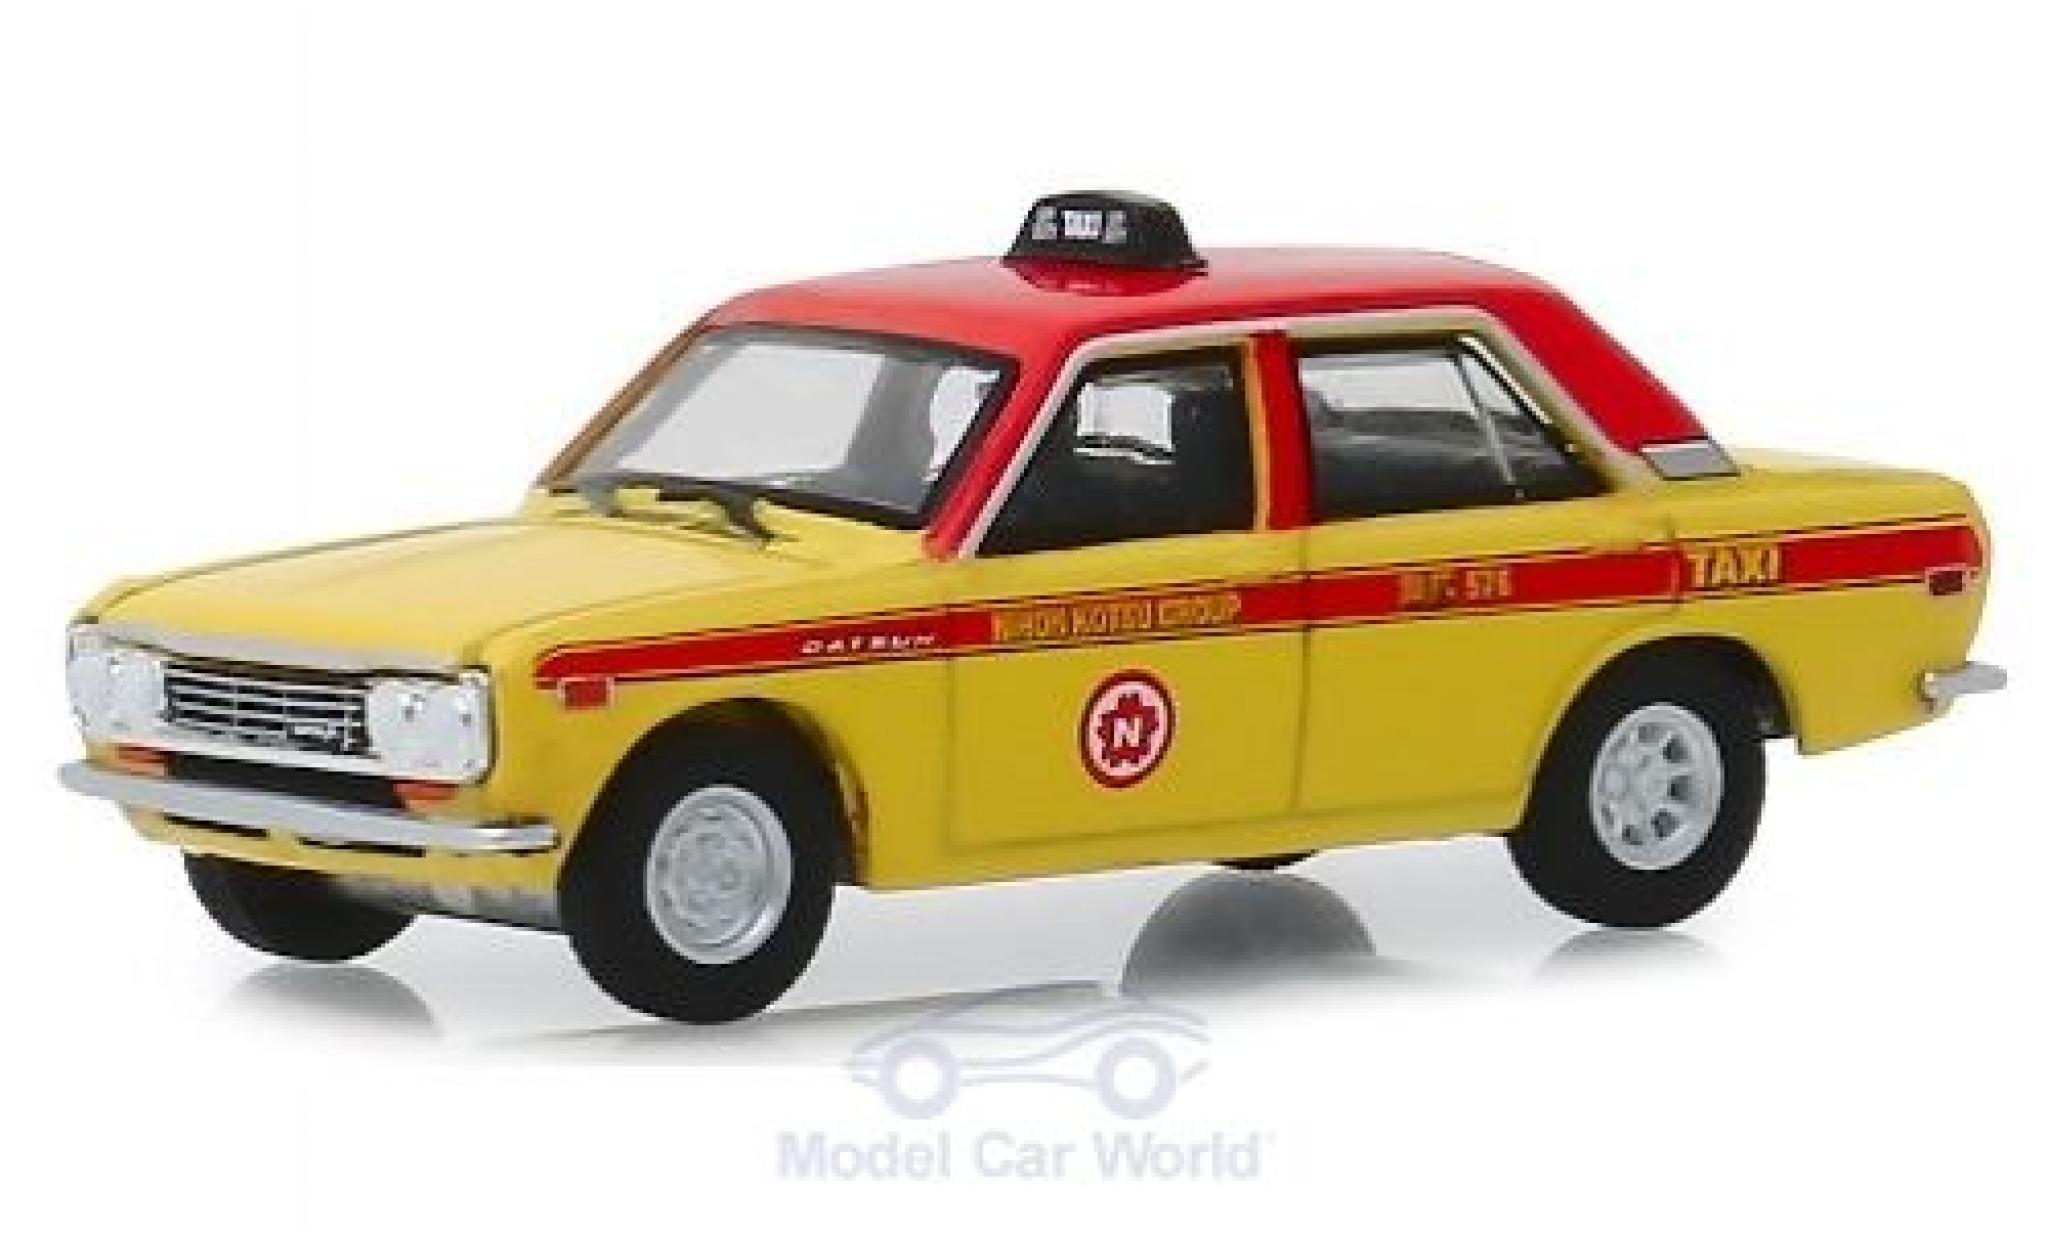 Datsun 510 1/64 Greenlight 4-Door Sedan Nihon Kotsu Group - Taxi 1970